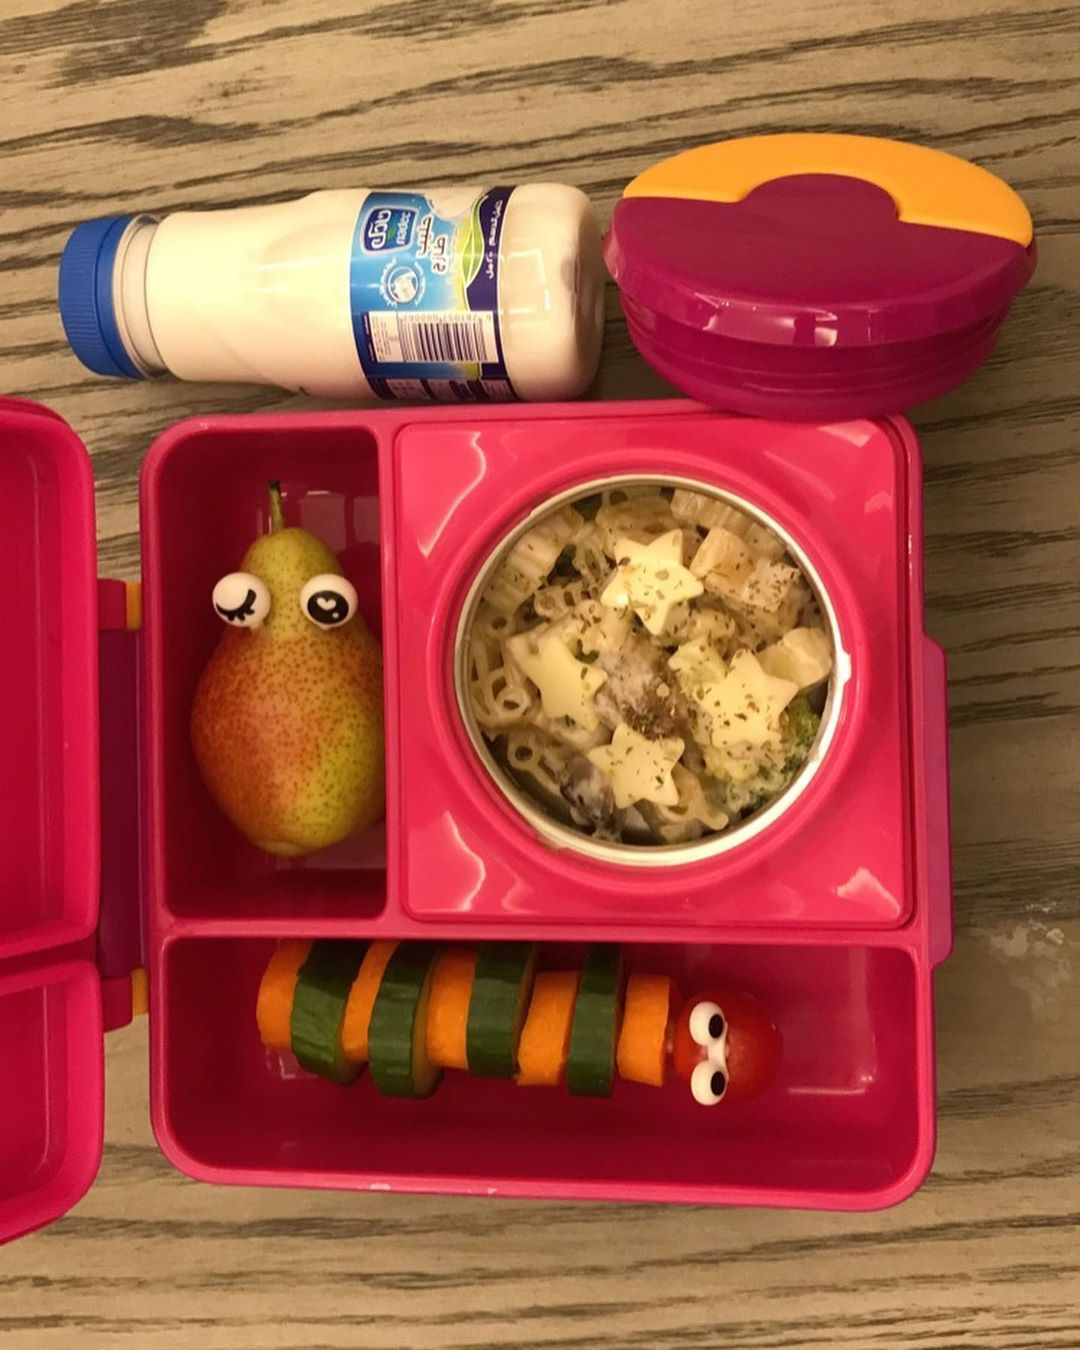 Lunch Box On Instagram صباح الخير فطورنا اليوم مكرونة بالفطر والبروكلي استخدمت مكرونة أشكال المرح من قودي حركوا الصور عشان ت Lunch Box Idea Lunch Box Lunch